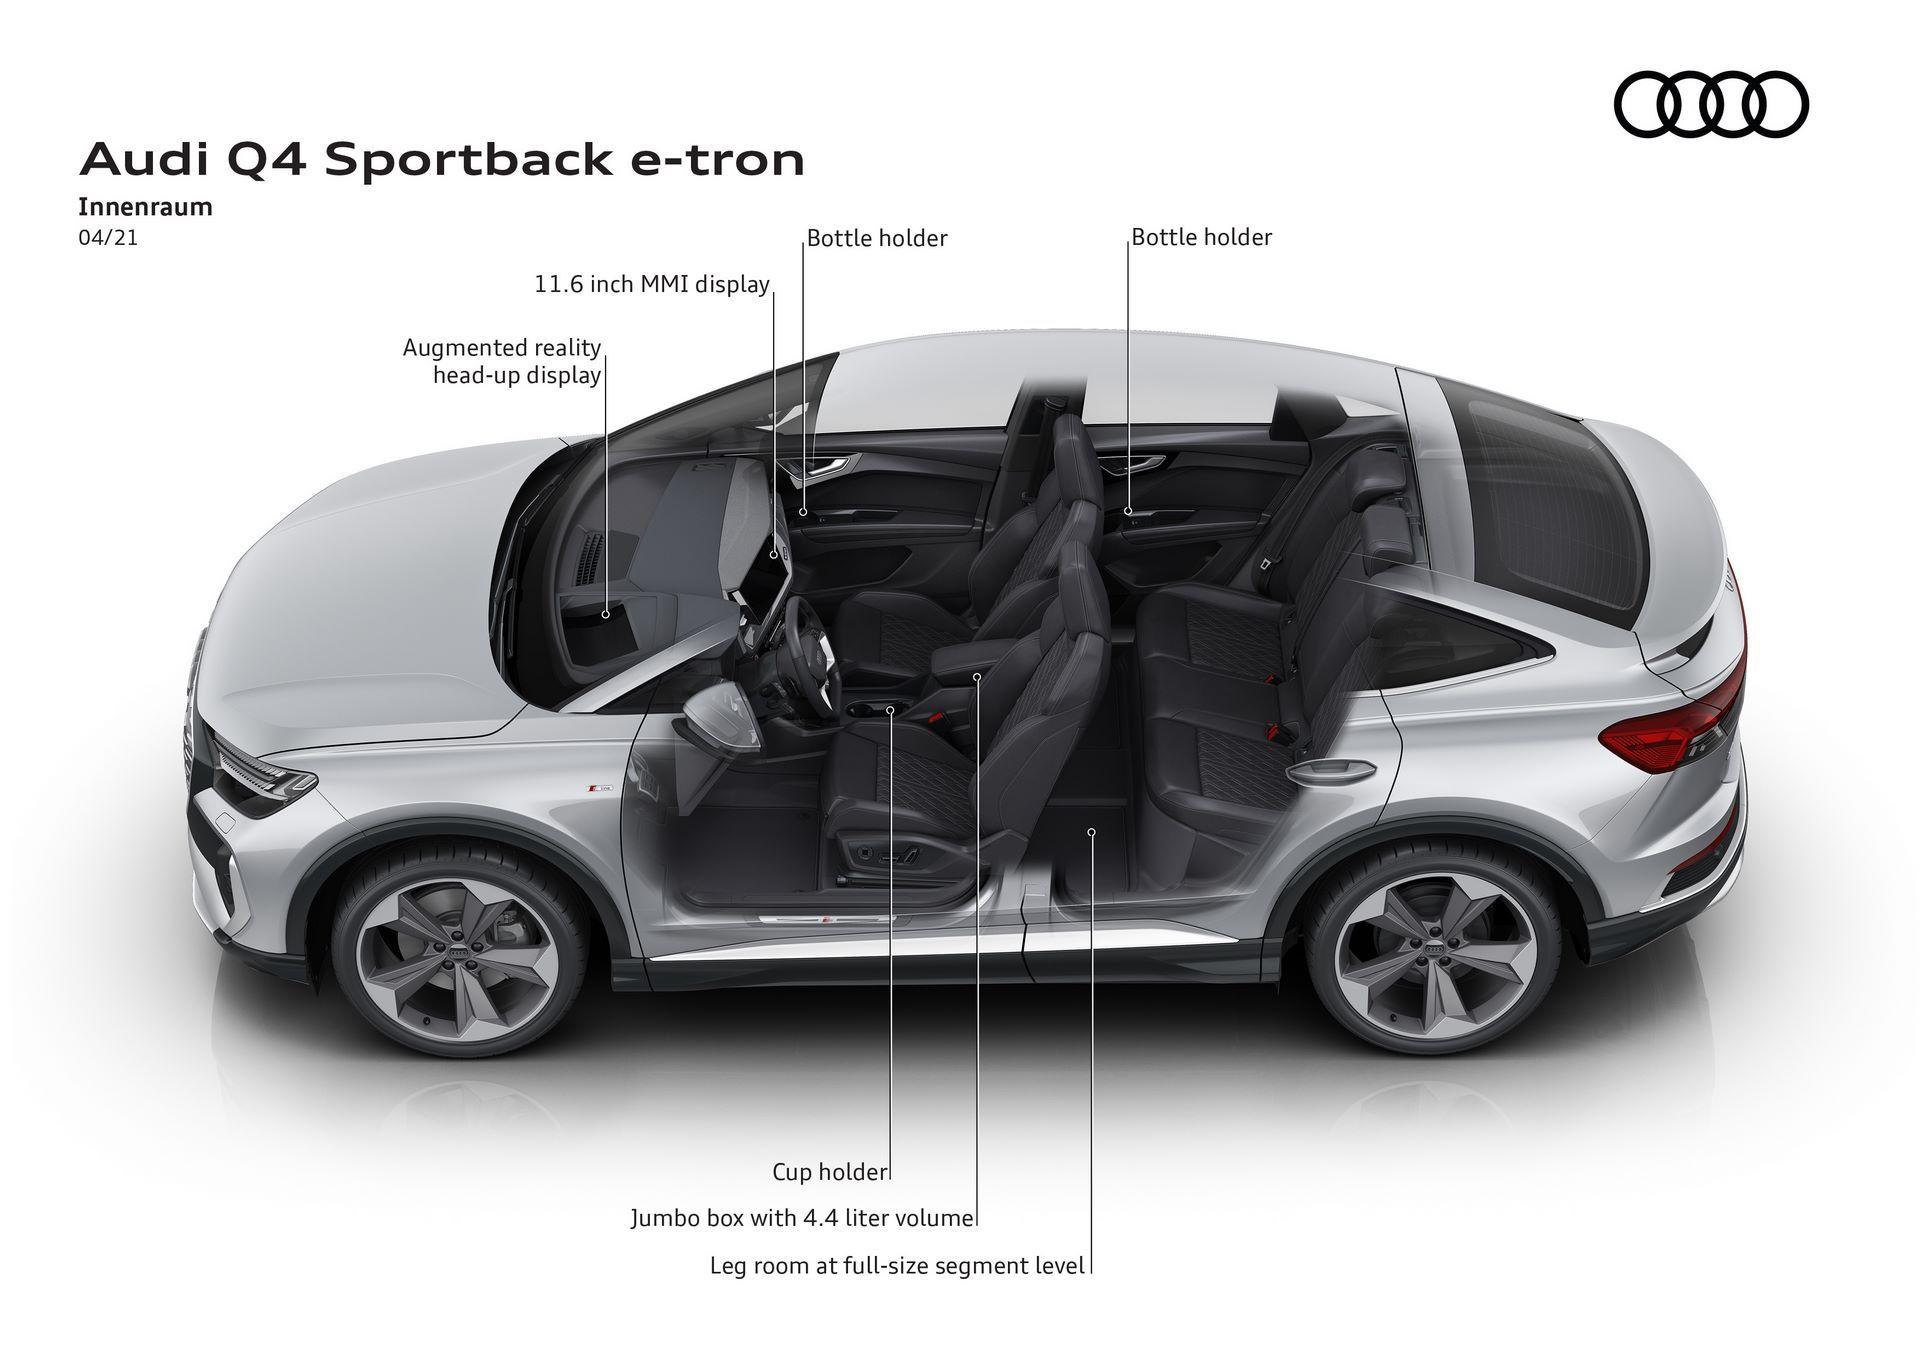 Audi-Q4-e-tron-and-Q4-e-tron-Sportback-139